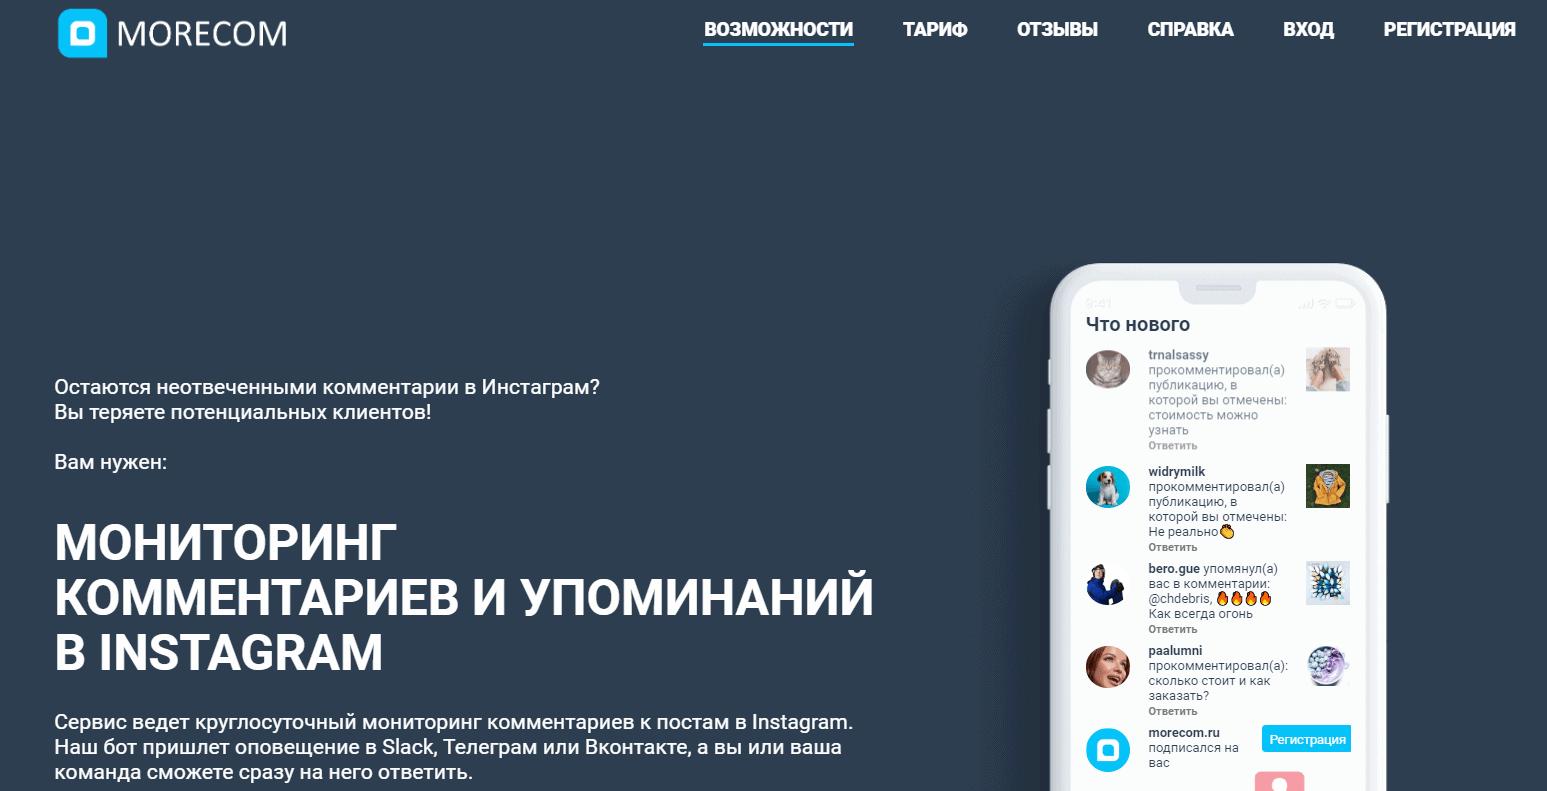 Morecom — мониторинг комментариев в Инстаграм